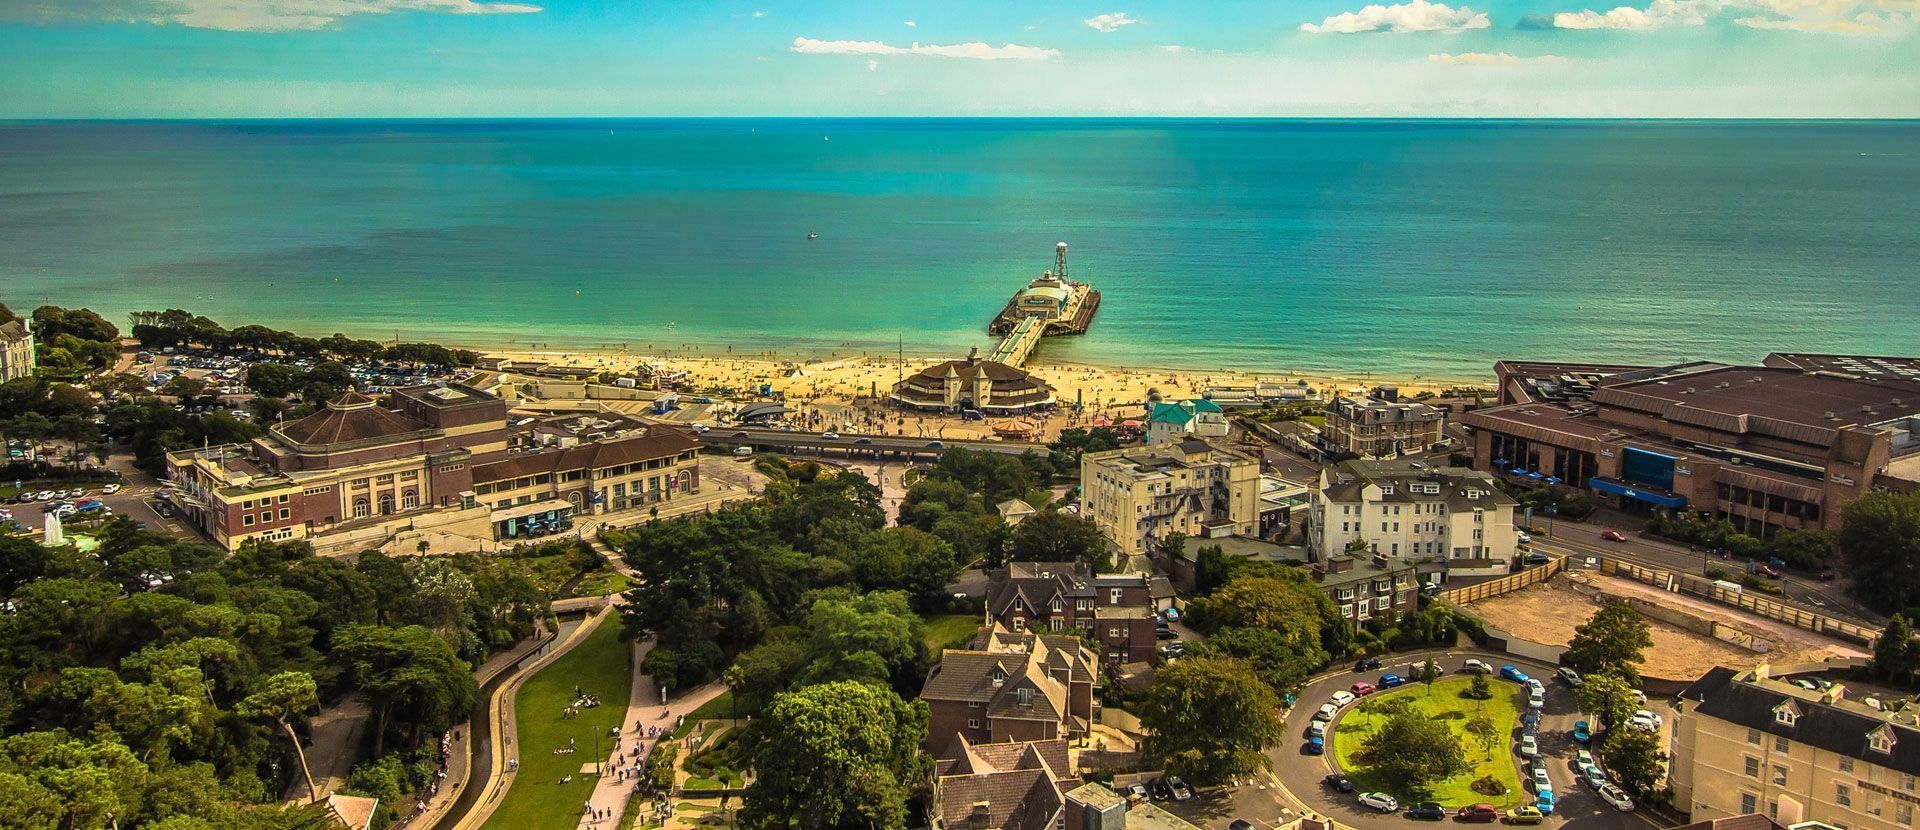 Kings Bournemouth Reino Unido curso de ingles ASTEX